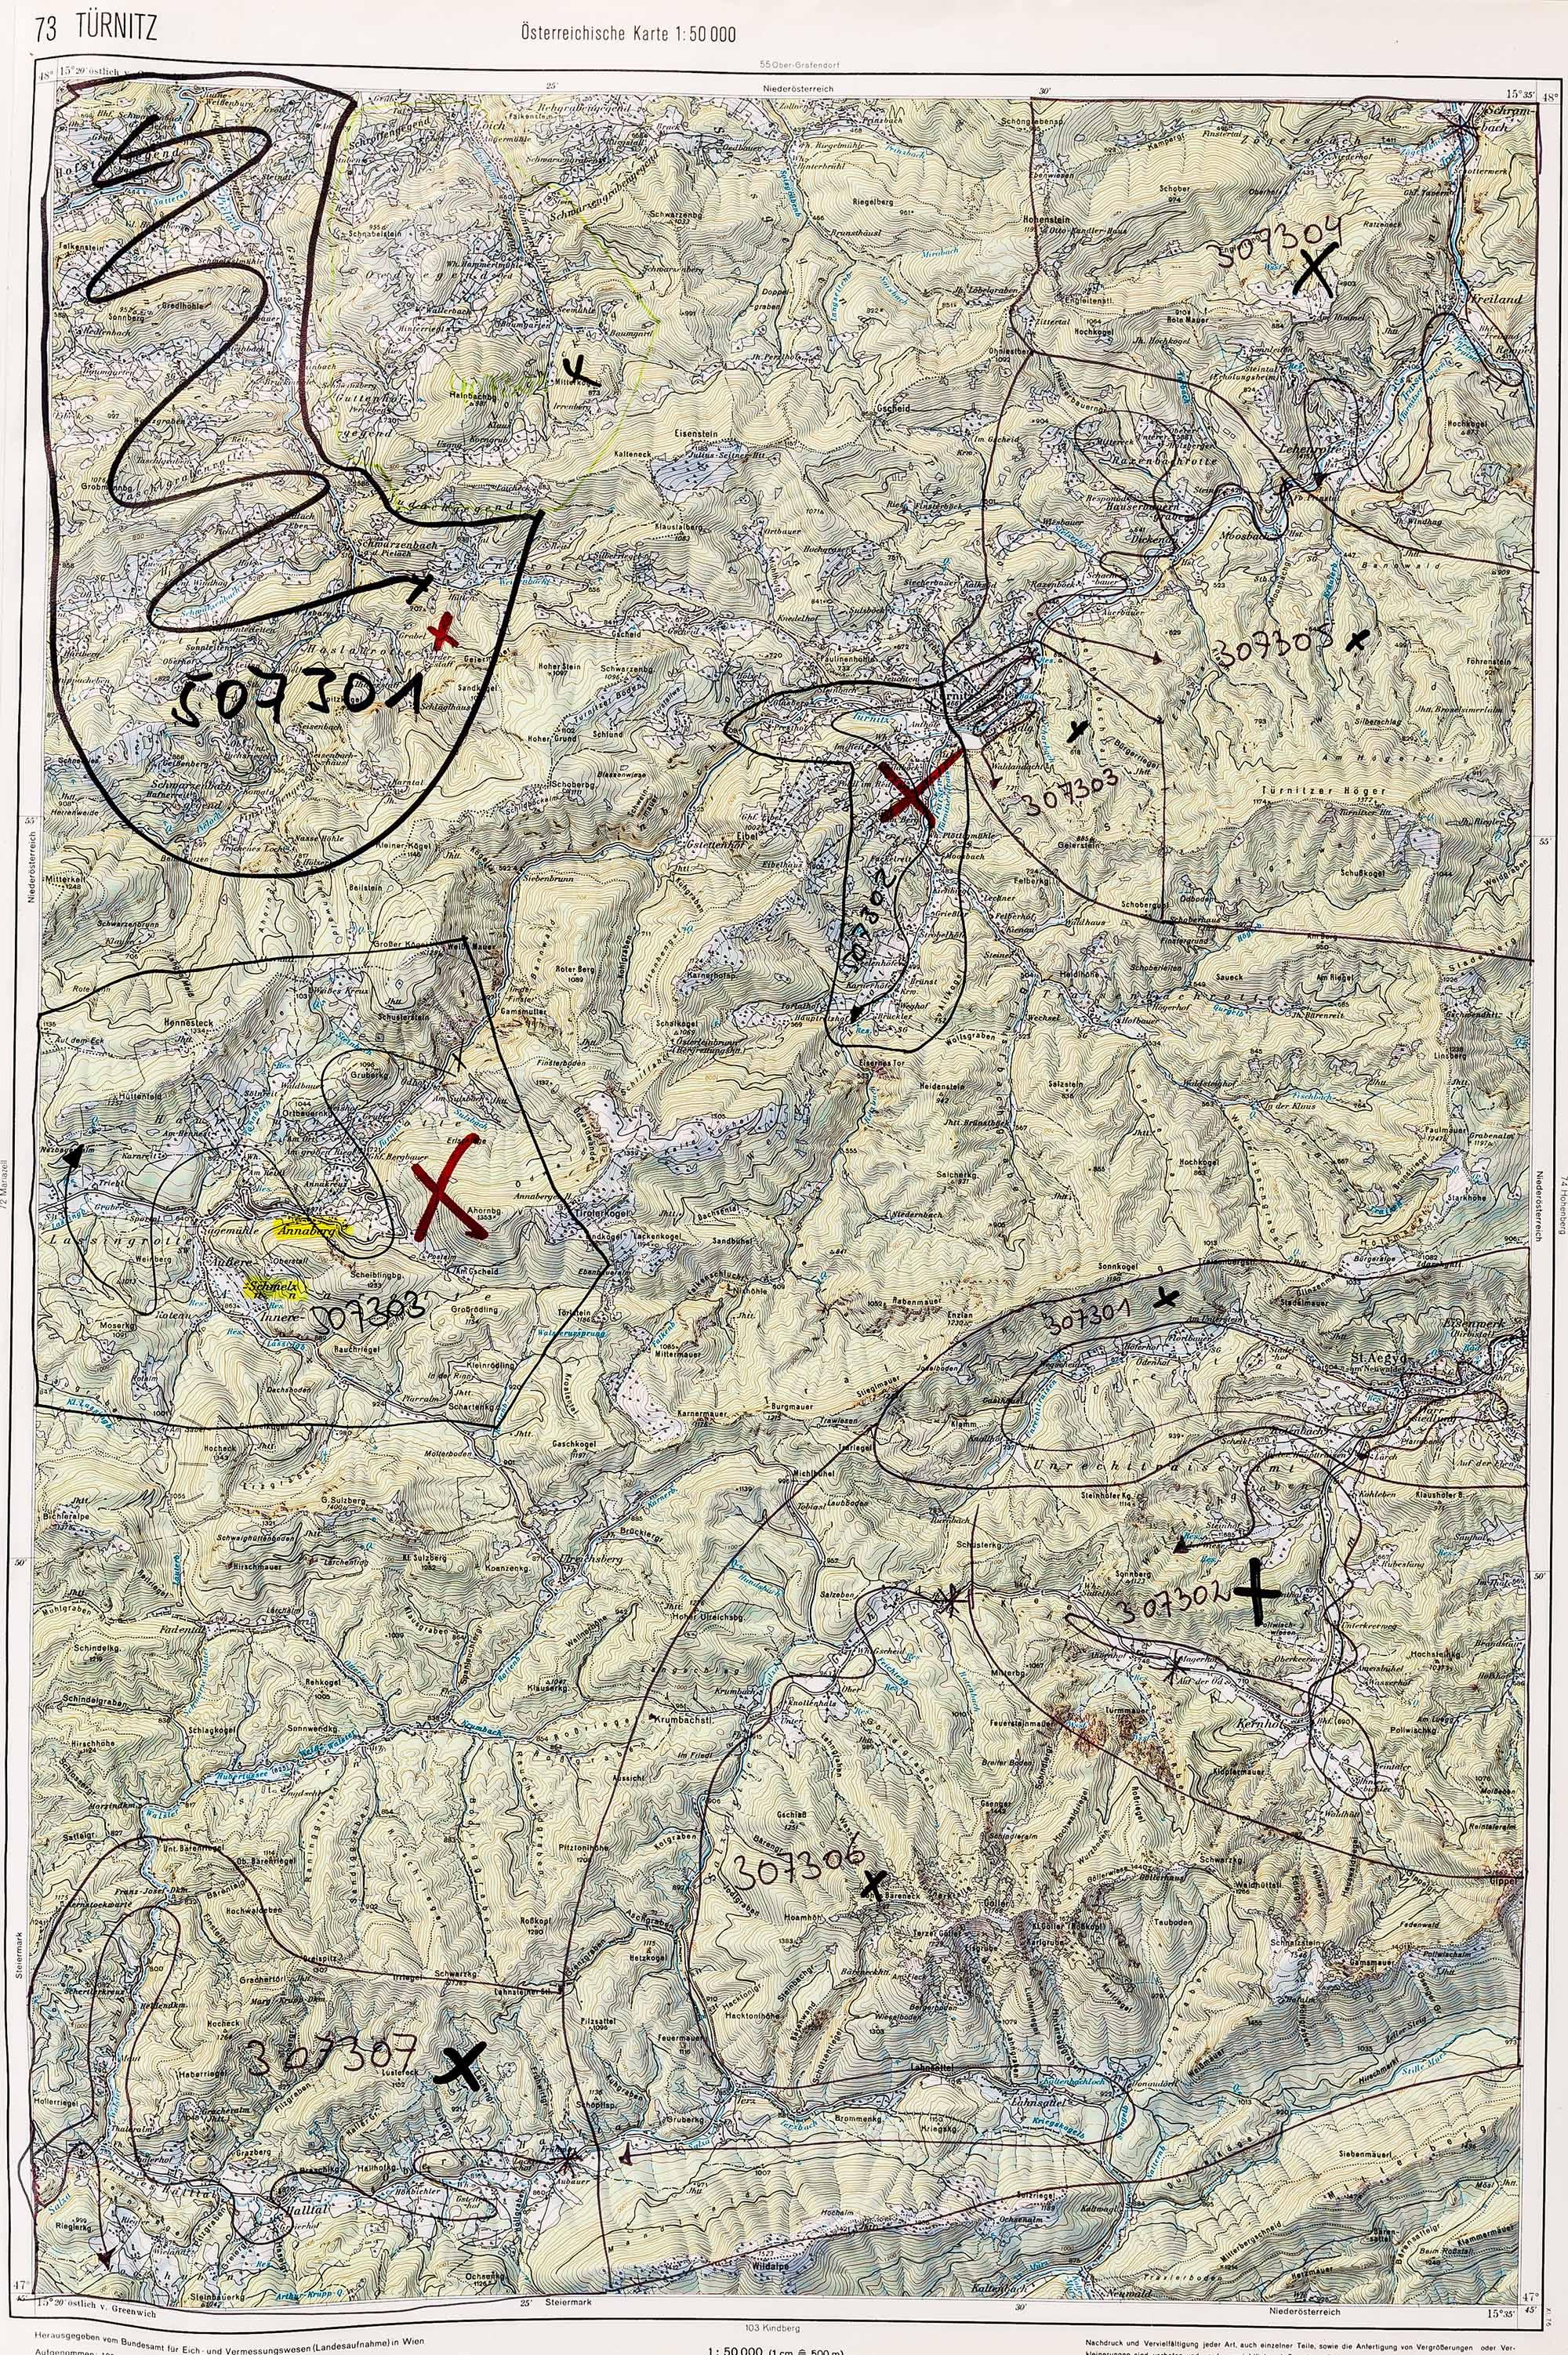 1983-1986 Karte 073